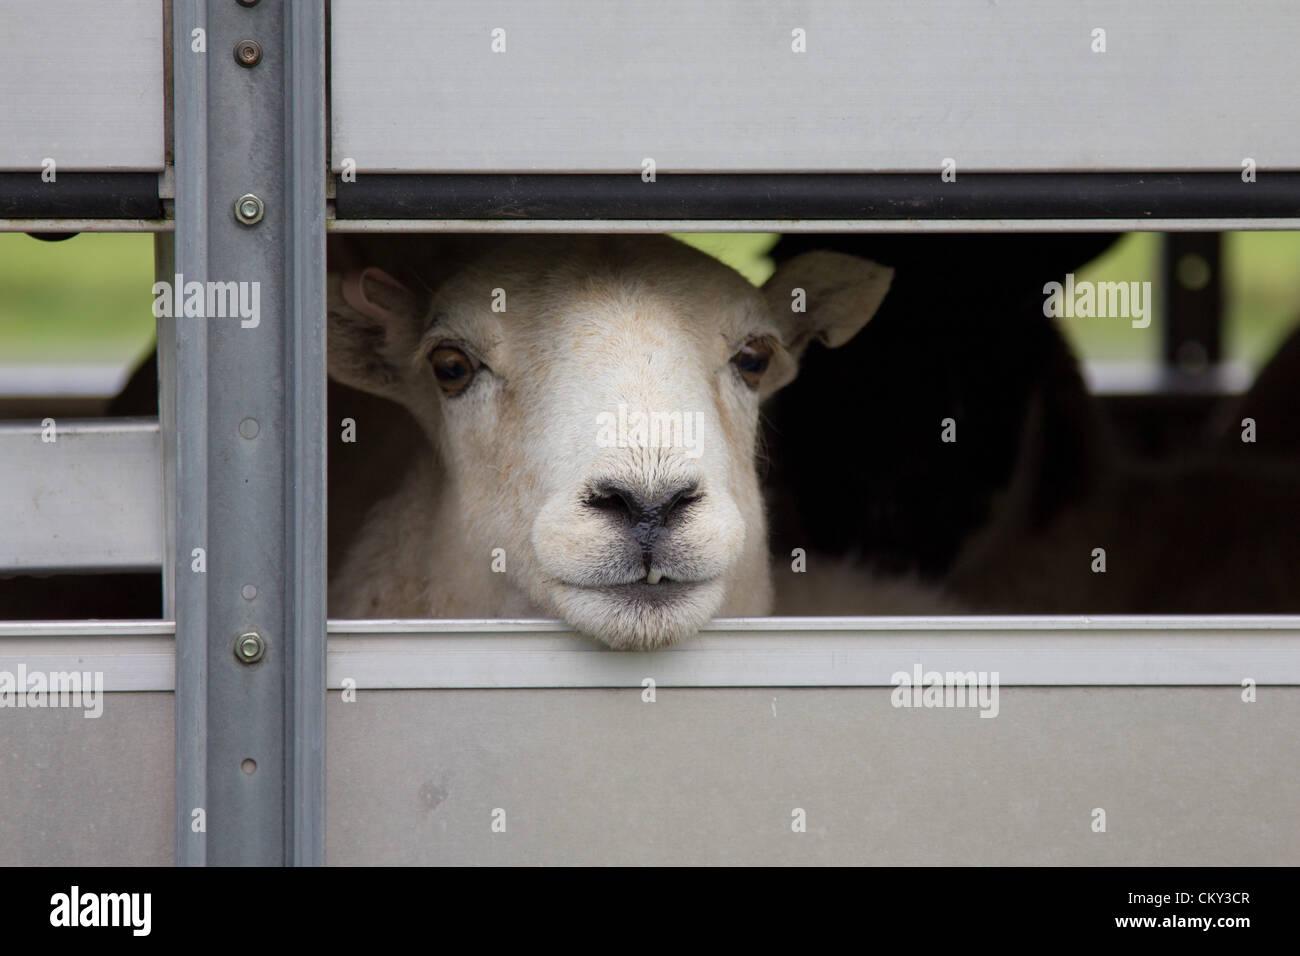 Transporting Sheep Stock Photos & Transporting Sheep Stock